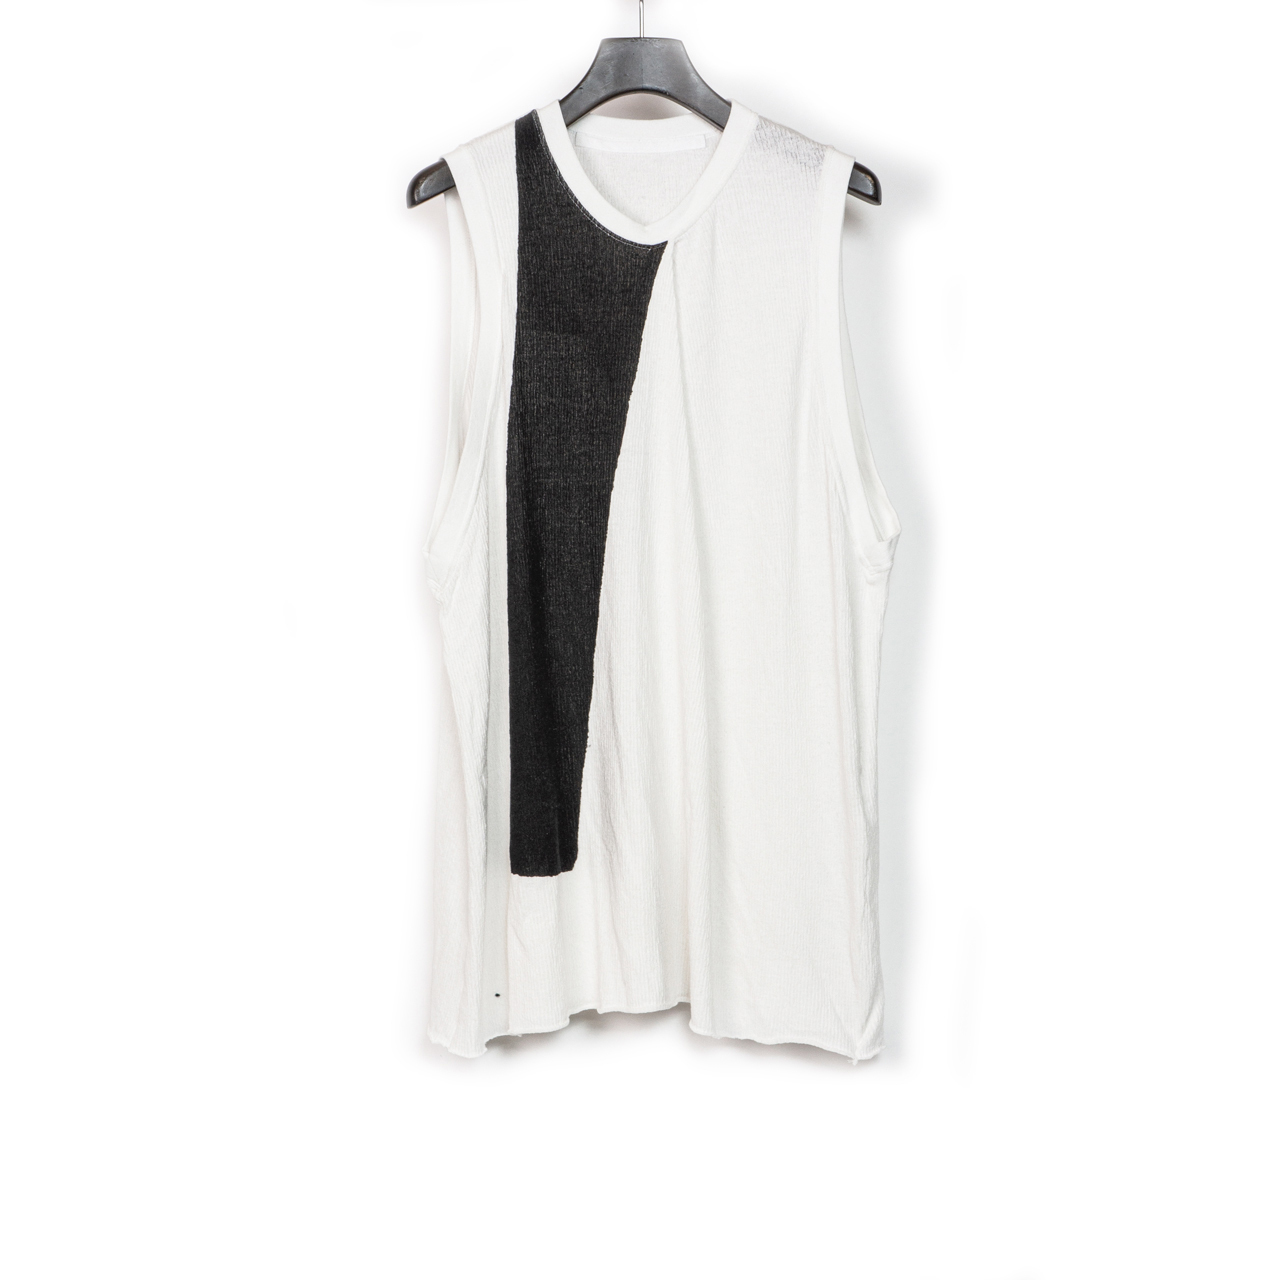 697CUM8-P-WHITE / フロントドレープノースリーブシャツ